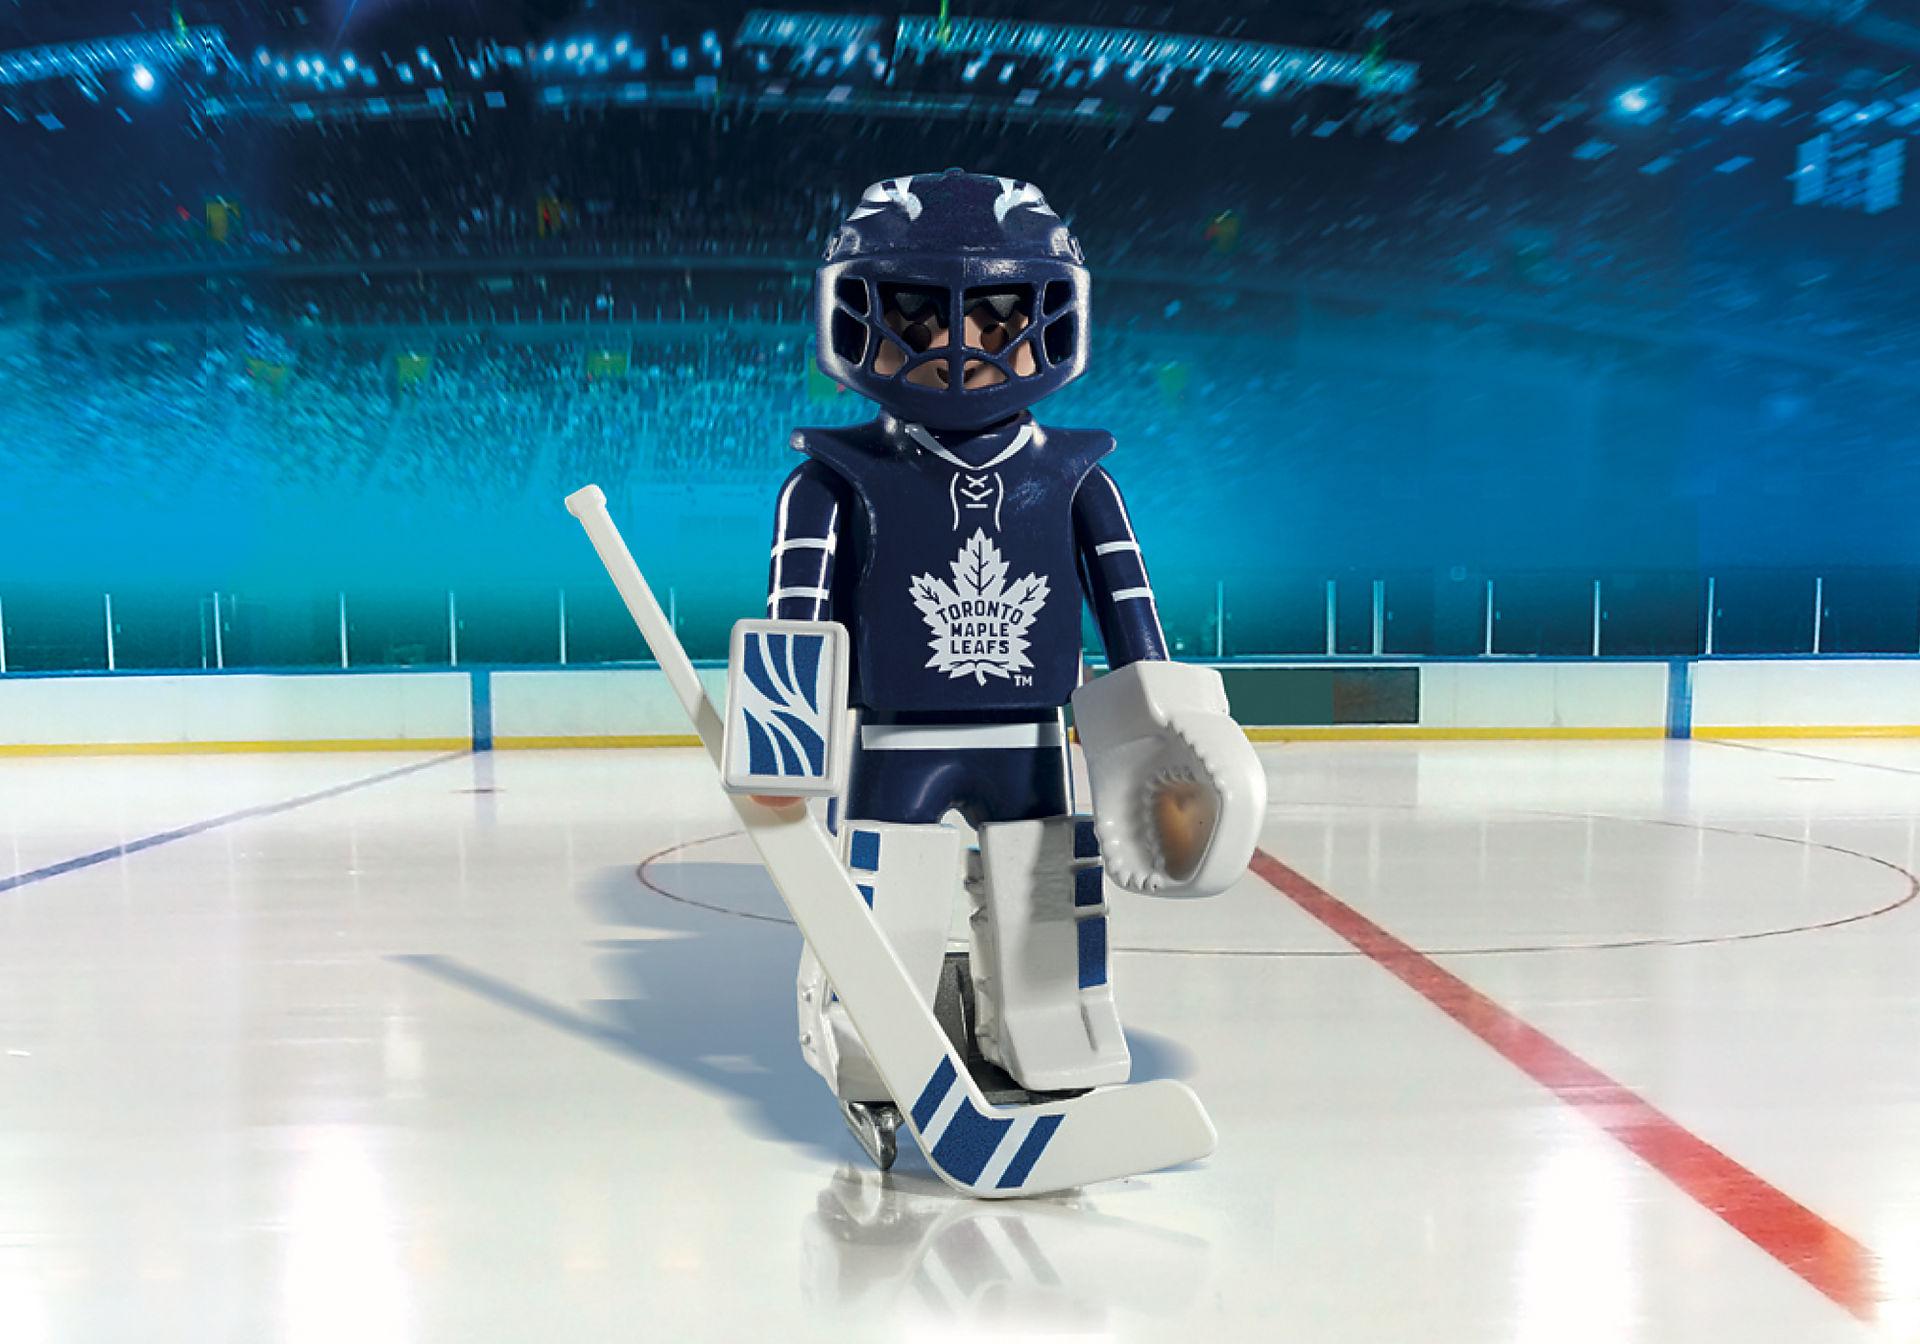 5083 NHL® Toronto Maple Leafs® Goalie zoom image1